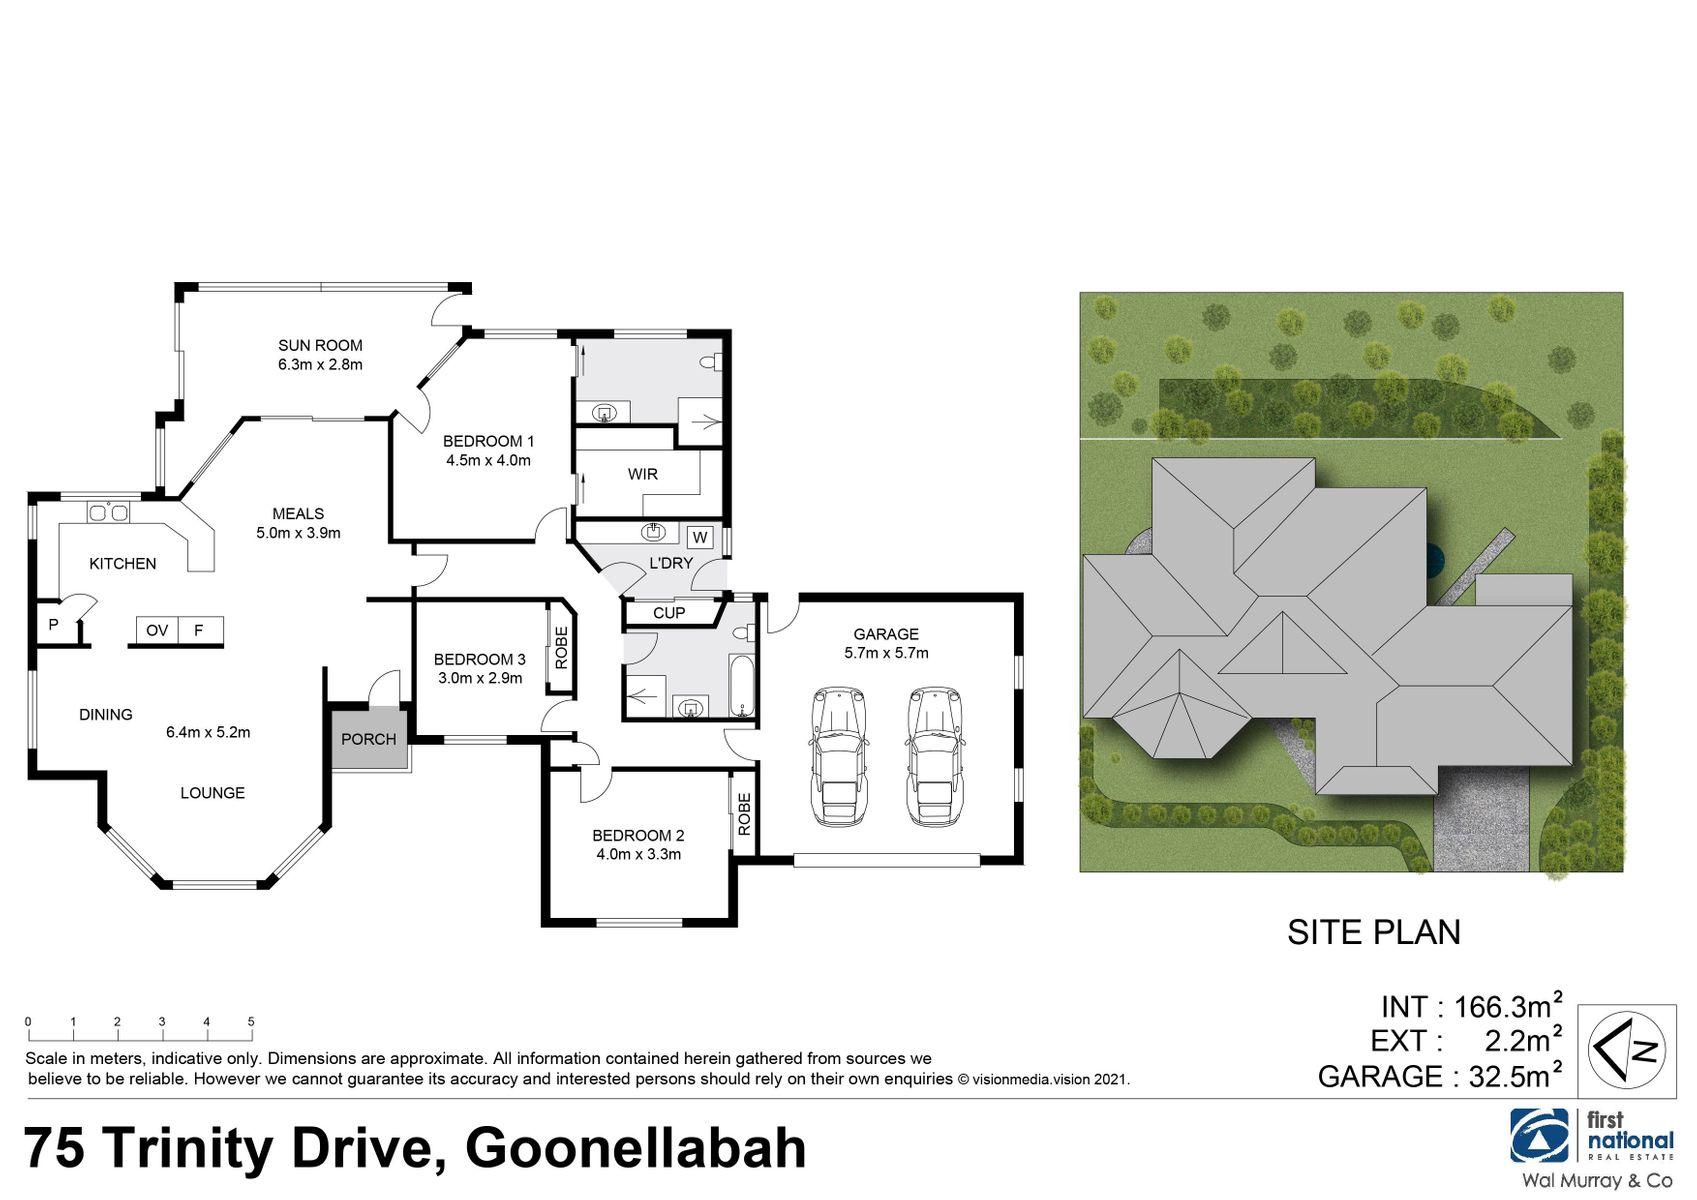 75 Trinity Drive, Goonellabah, NSW 2480